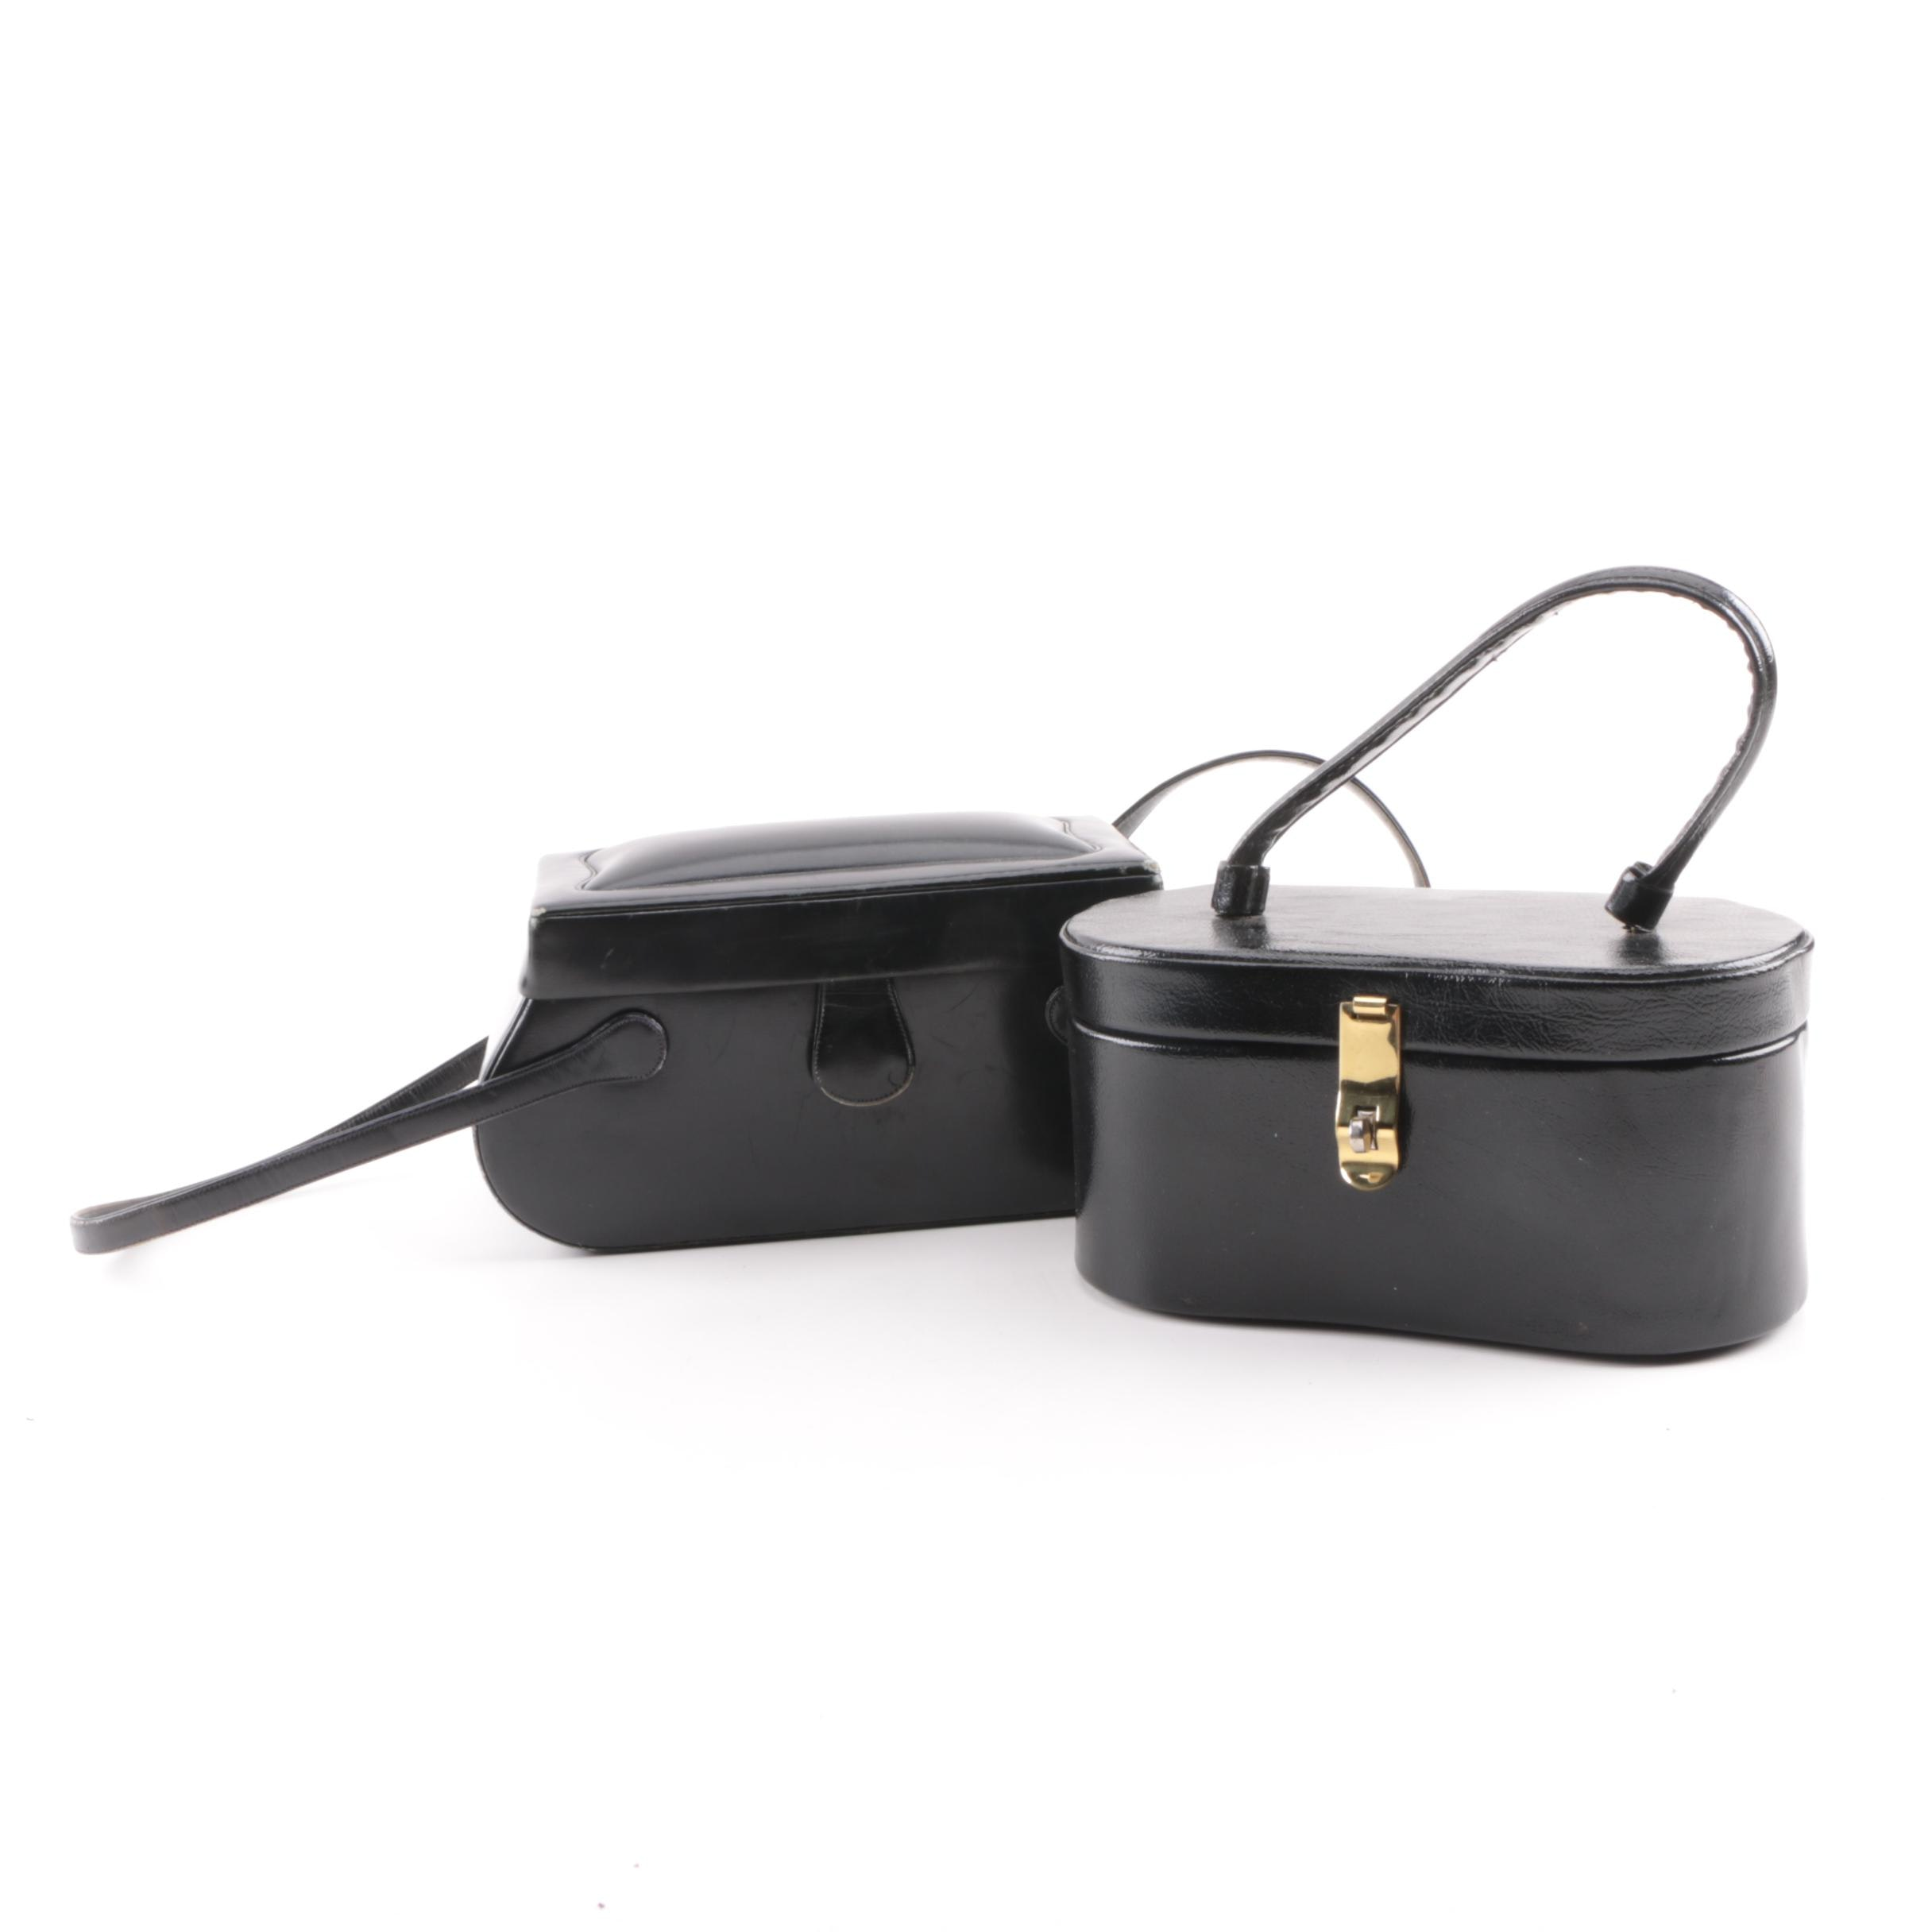 Vintage Black Leather and Faux Leather Box Purses Including Coblentz